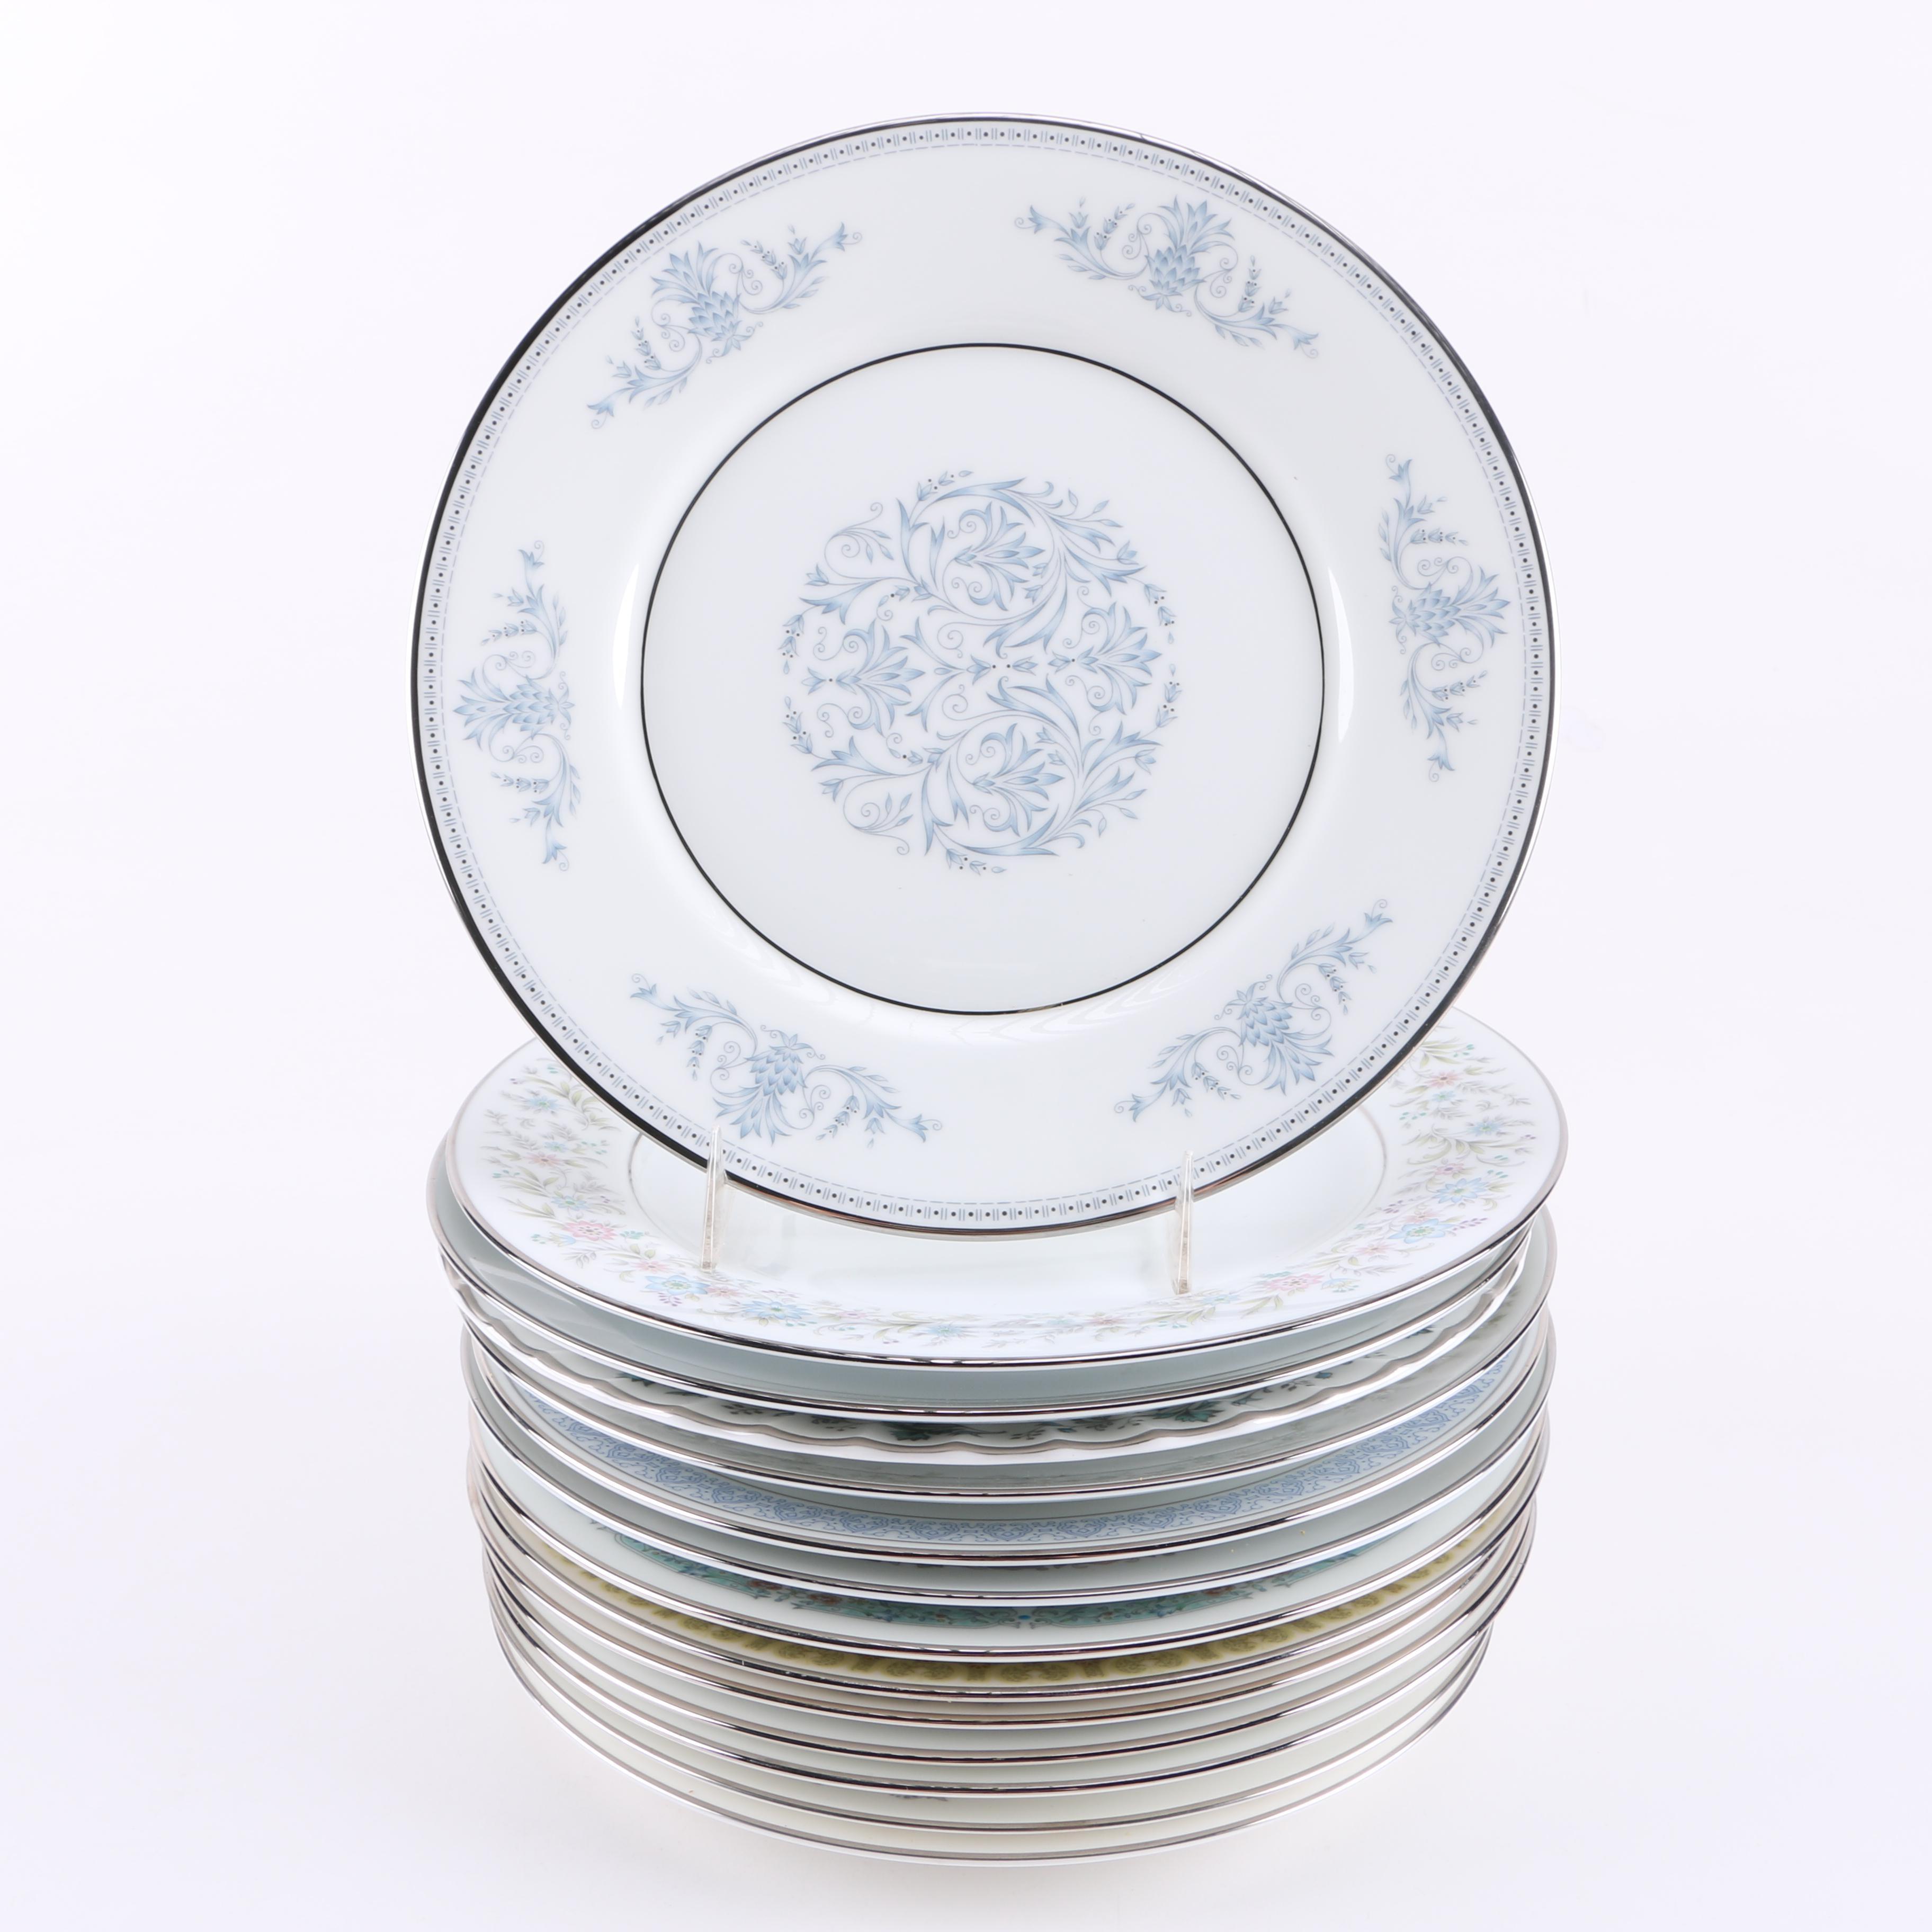 Assorted Silver-Tone Rim China Plates